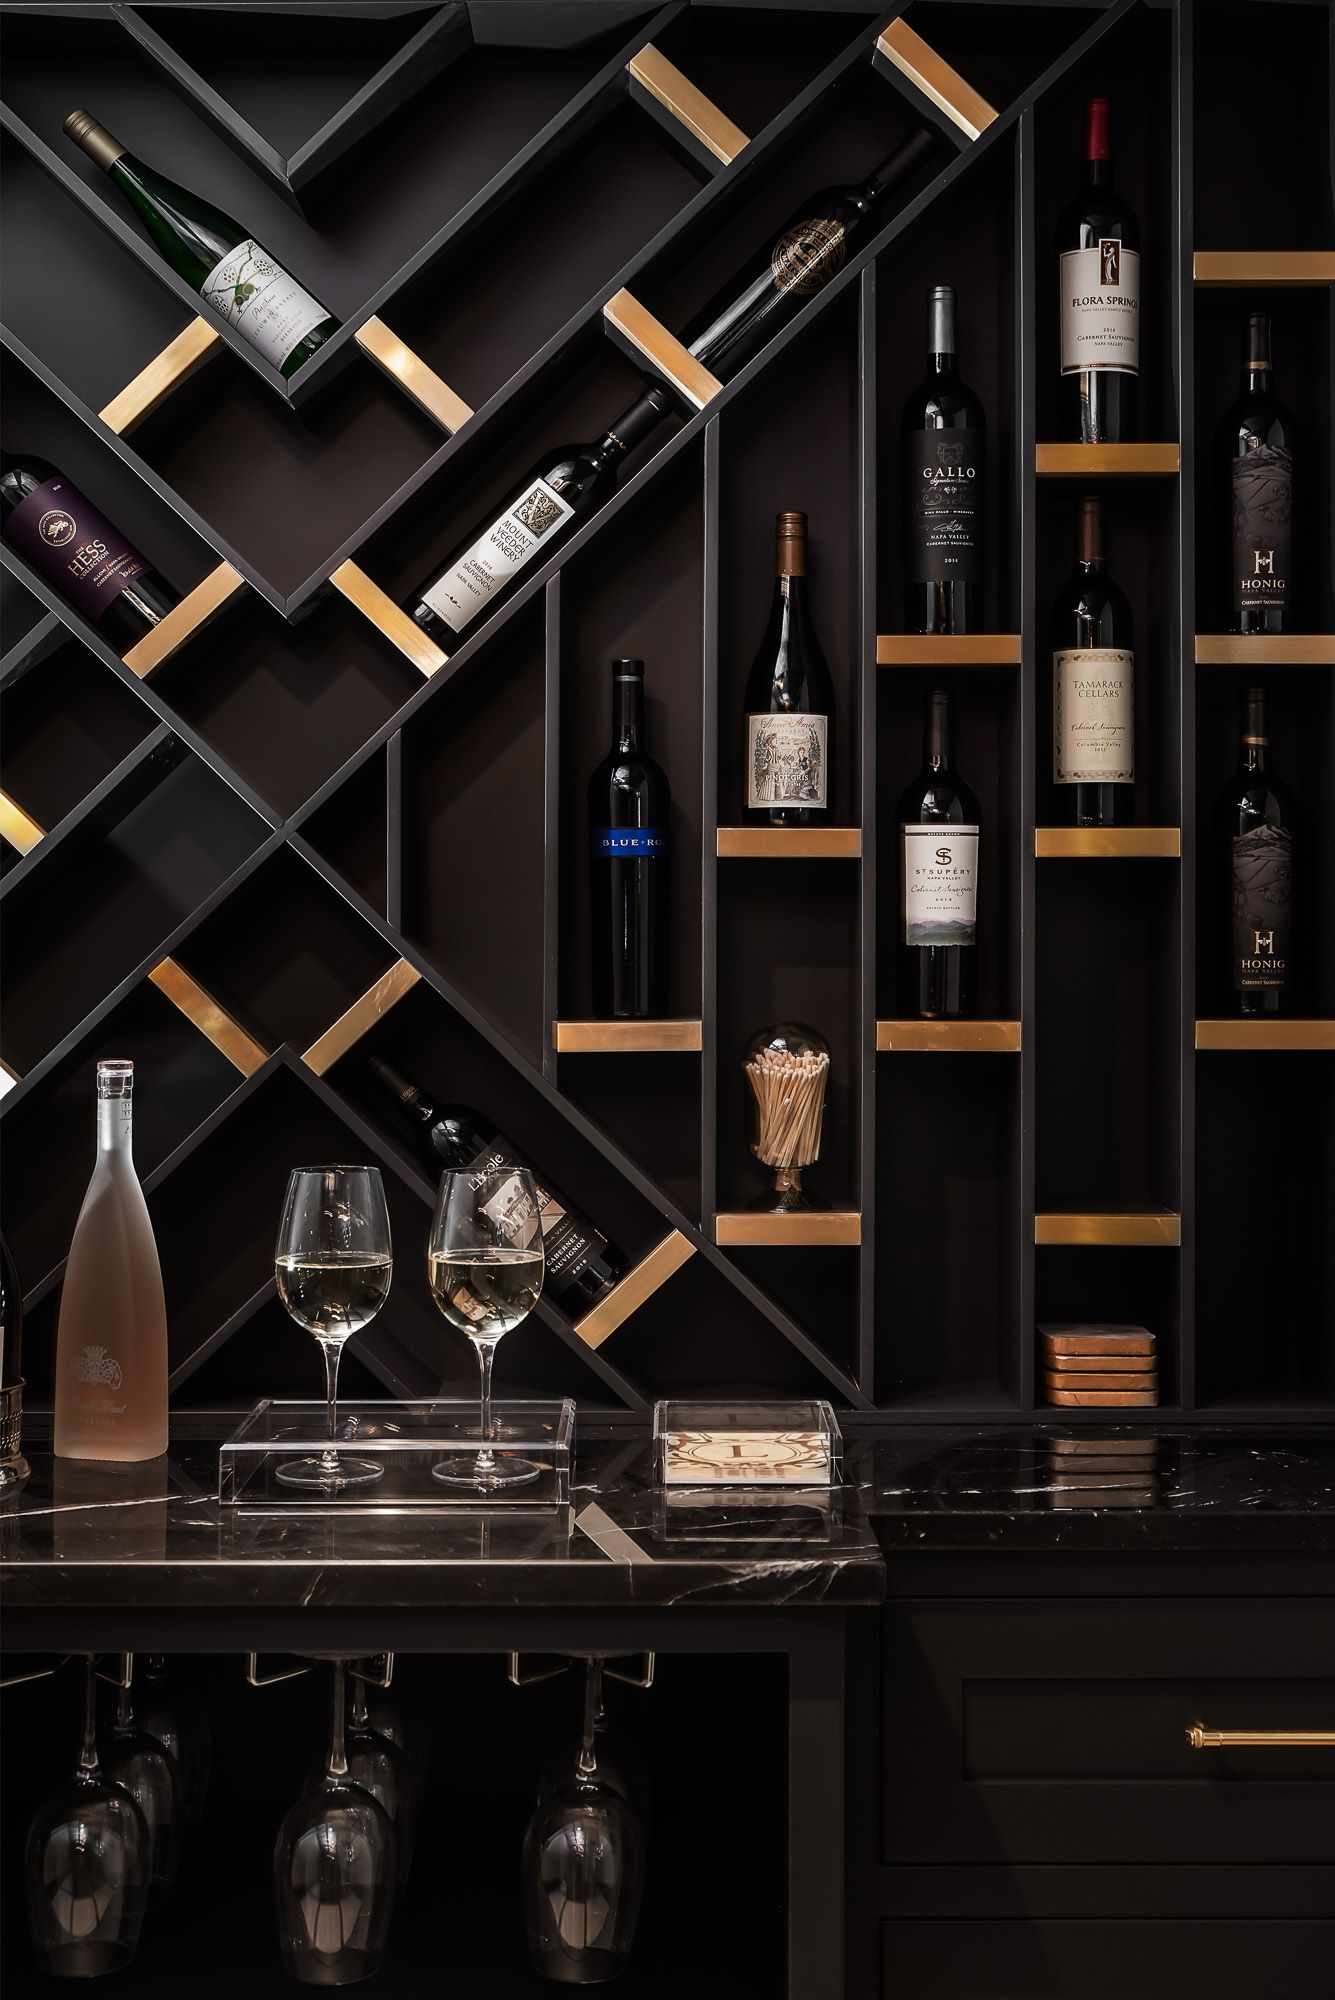 Wine Cellar   Wine Cooler   Wine Storage   Tasting